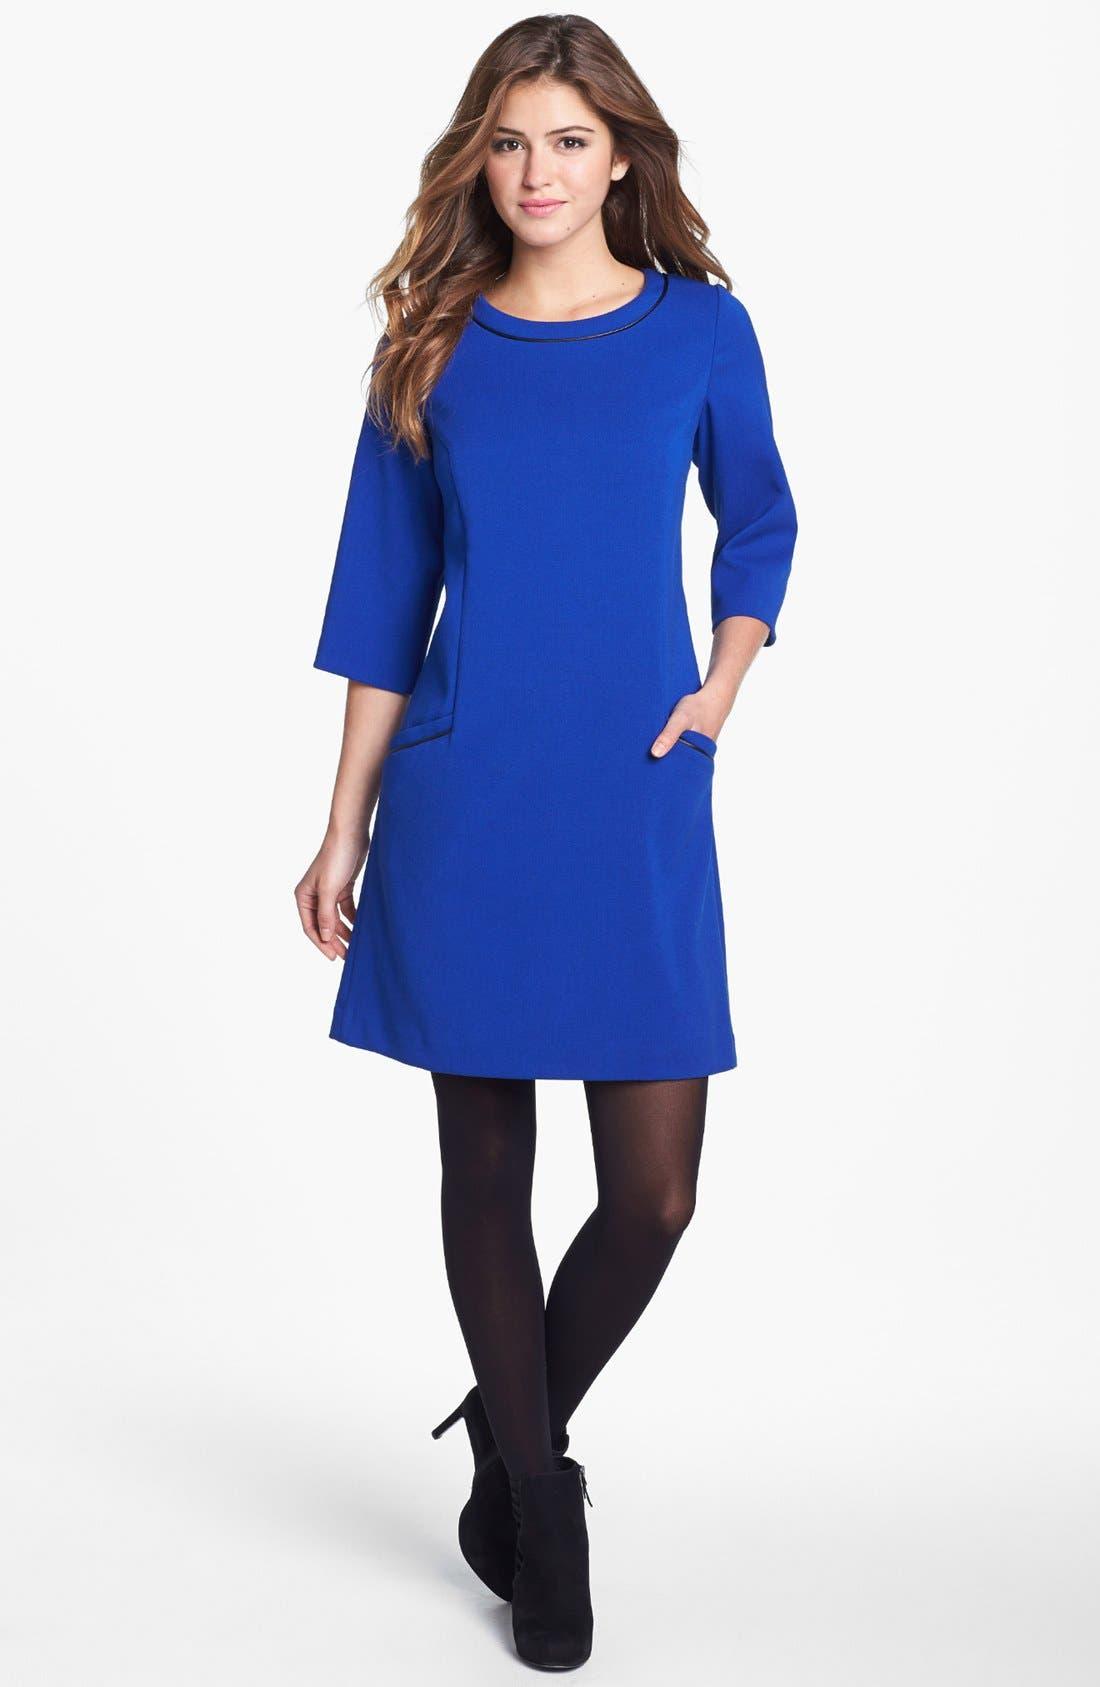 Alternate Image 1 Selected - Eliza J Faux Leather Trim Ponte Shift Dress (Online Only)